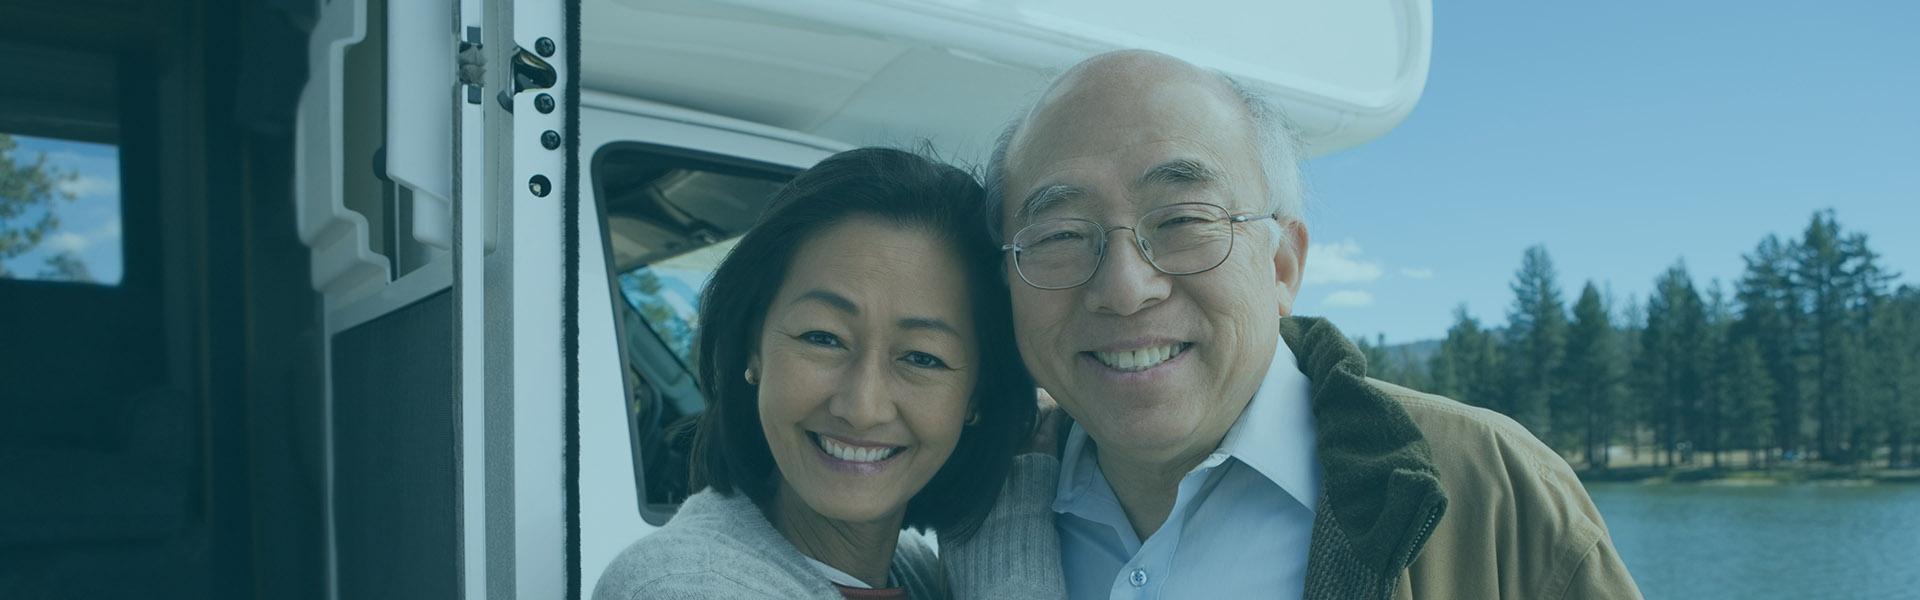 Senior Couple with Trailer